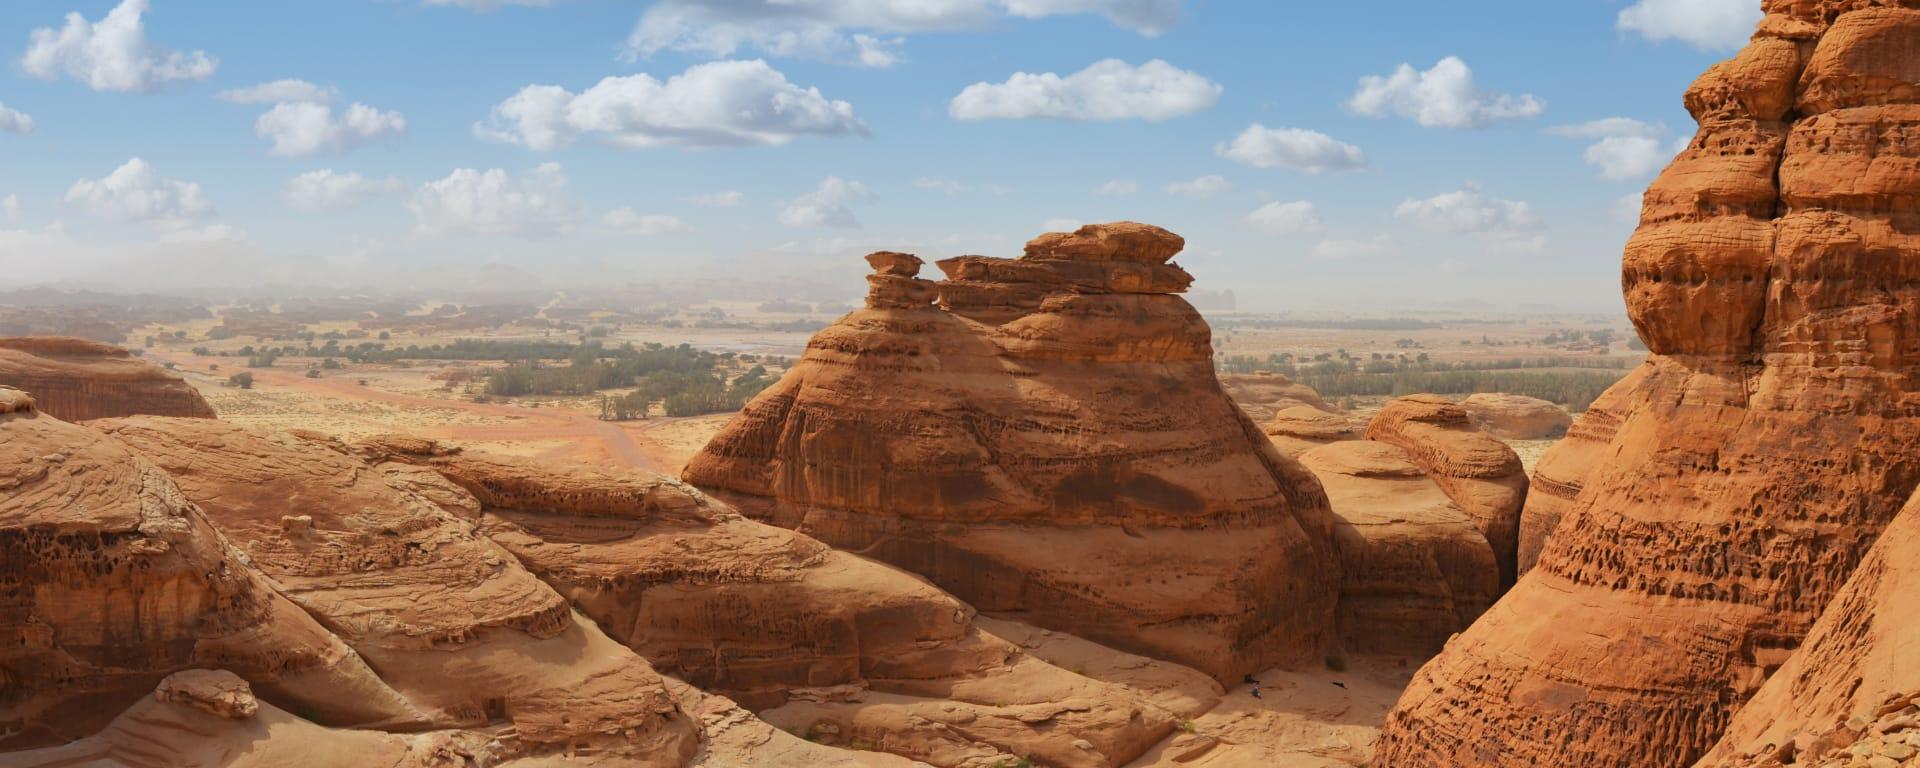 Saudi Arabien entdecken mit Tischler Reisen: Saudi Arabien Madain Saleh Felsformationen